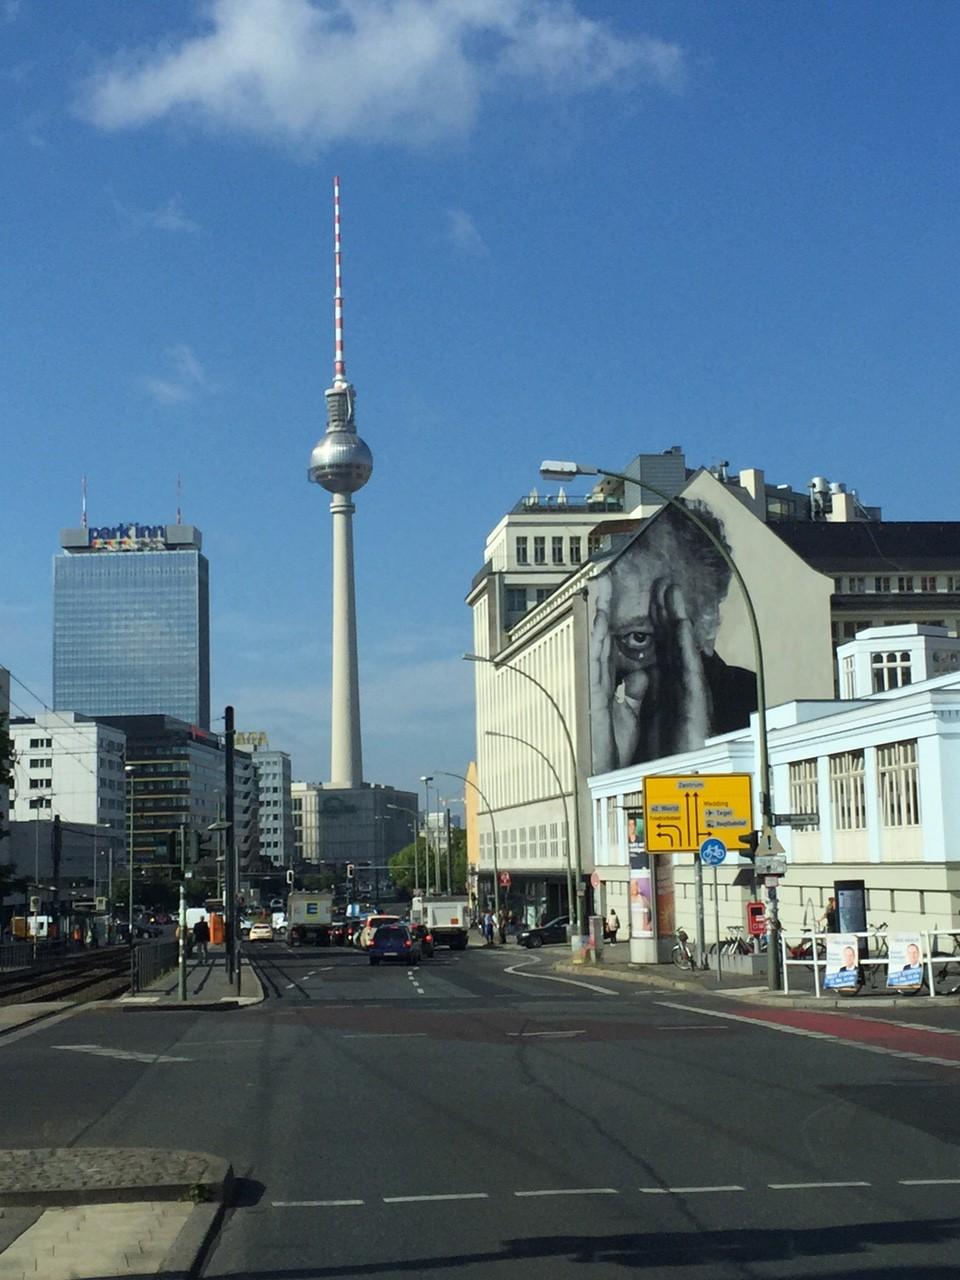 Telesparge, TV Tower, Fernsehturm, Berlin Tipps mit Kindern, Soho House, Streetart, Mama Blog